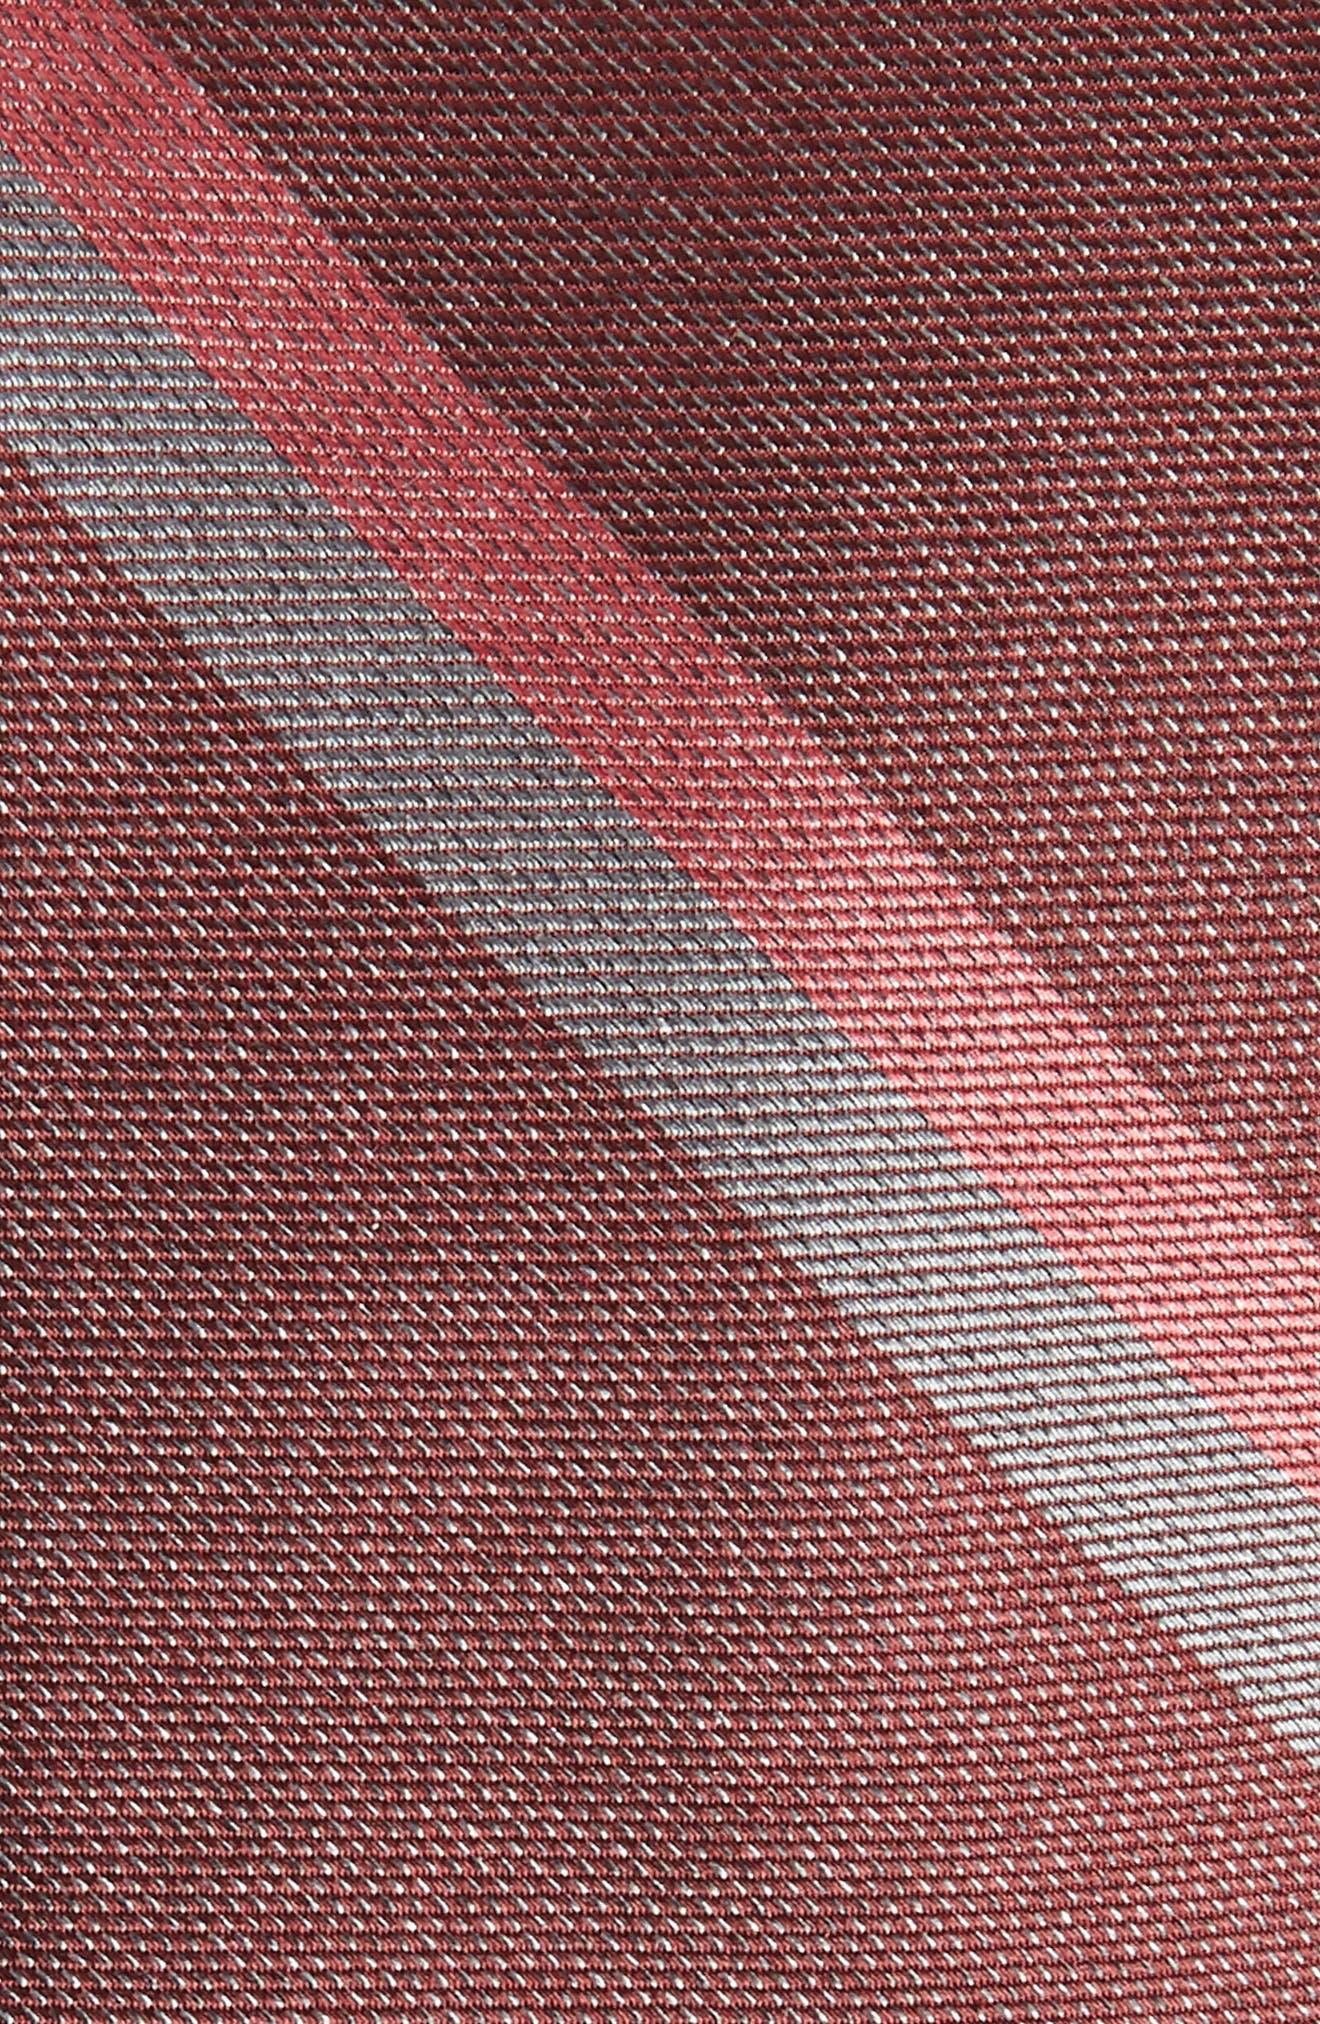 Stripe Silk Skinny Tie,                             Alternate thumbnail 2, color,                             Burgundy